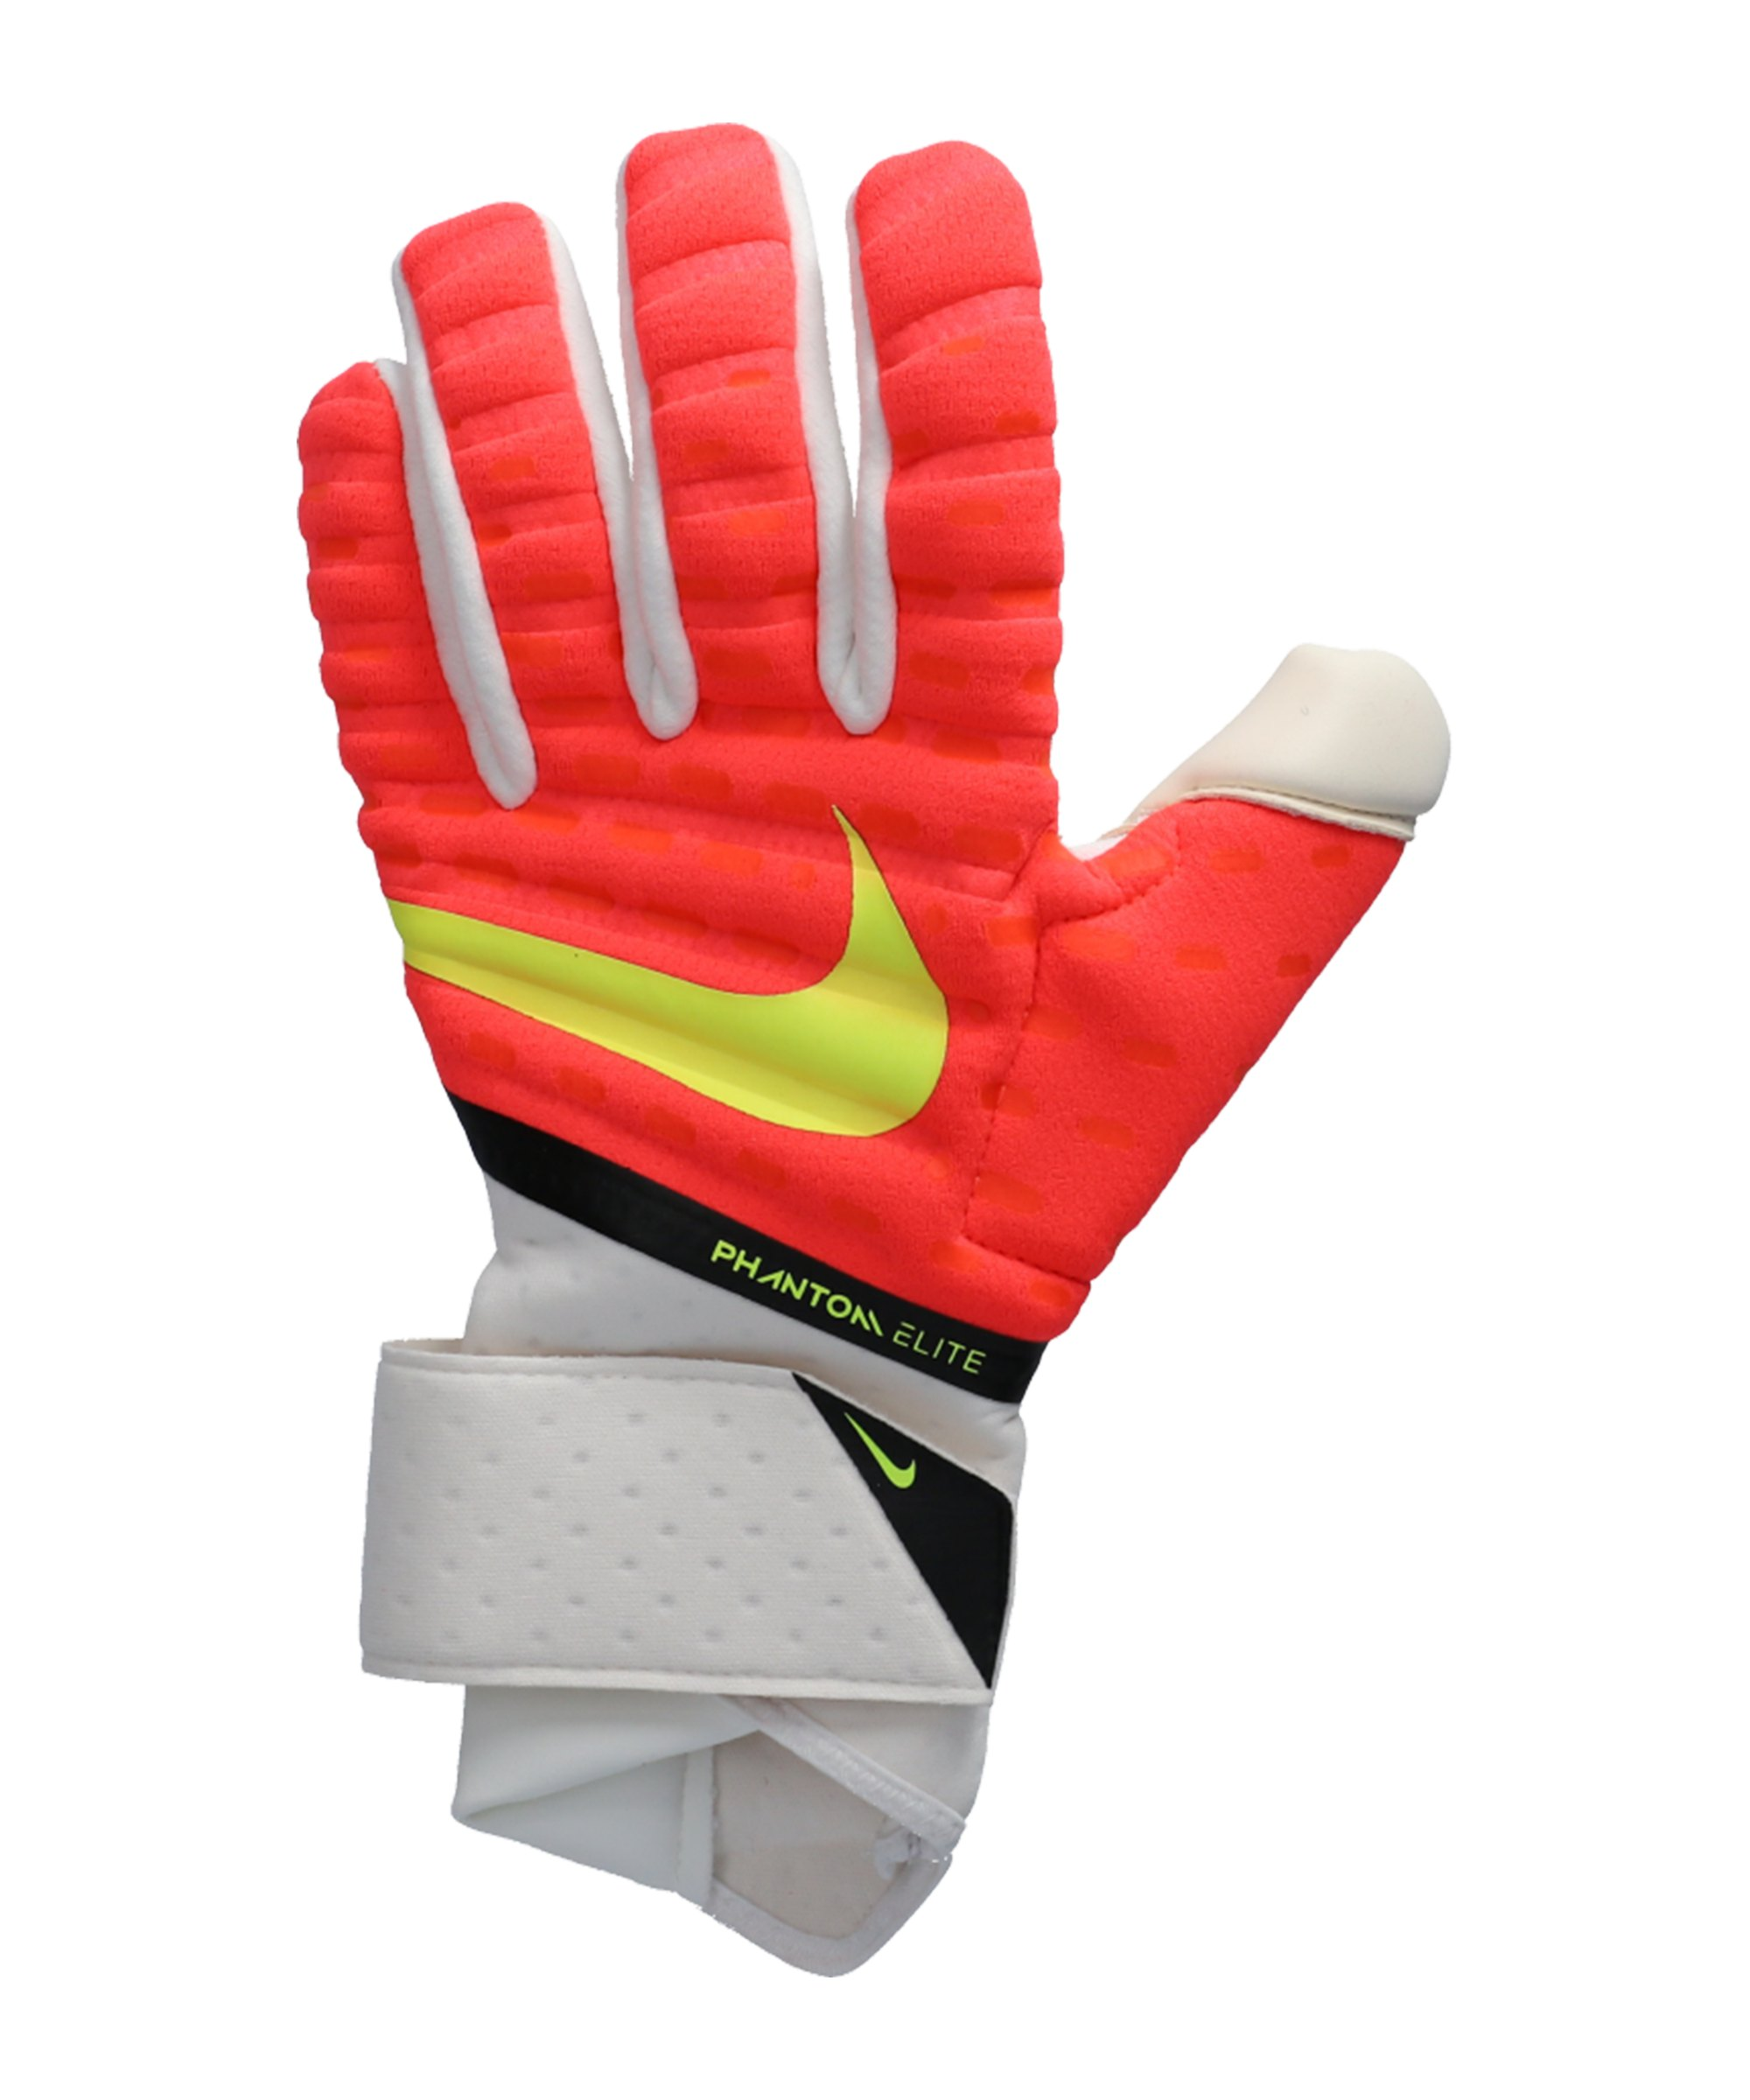 Nike Phantom Elite Promo TW-Handschuhe Rot Weiss Gelb F635 - rot